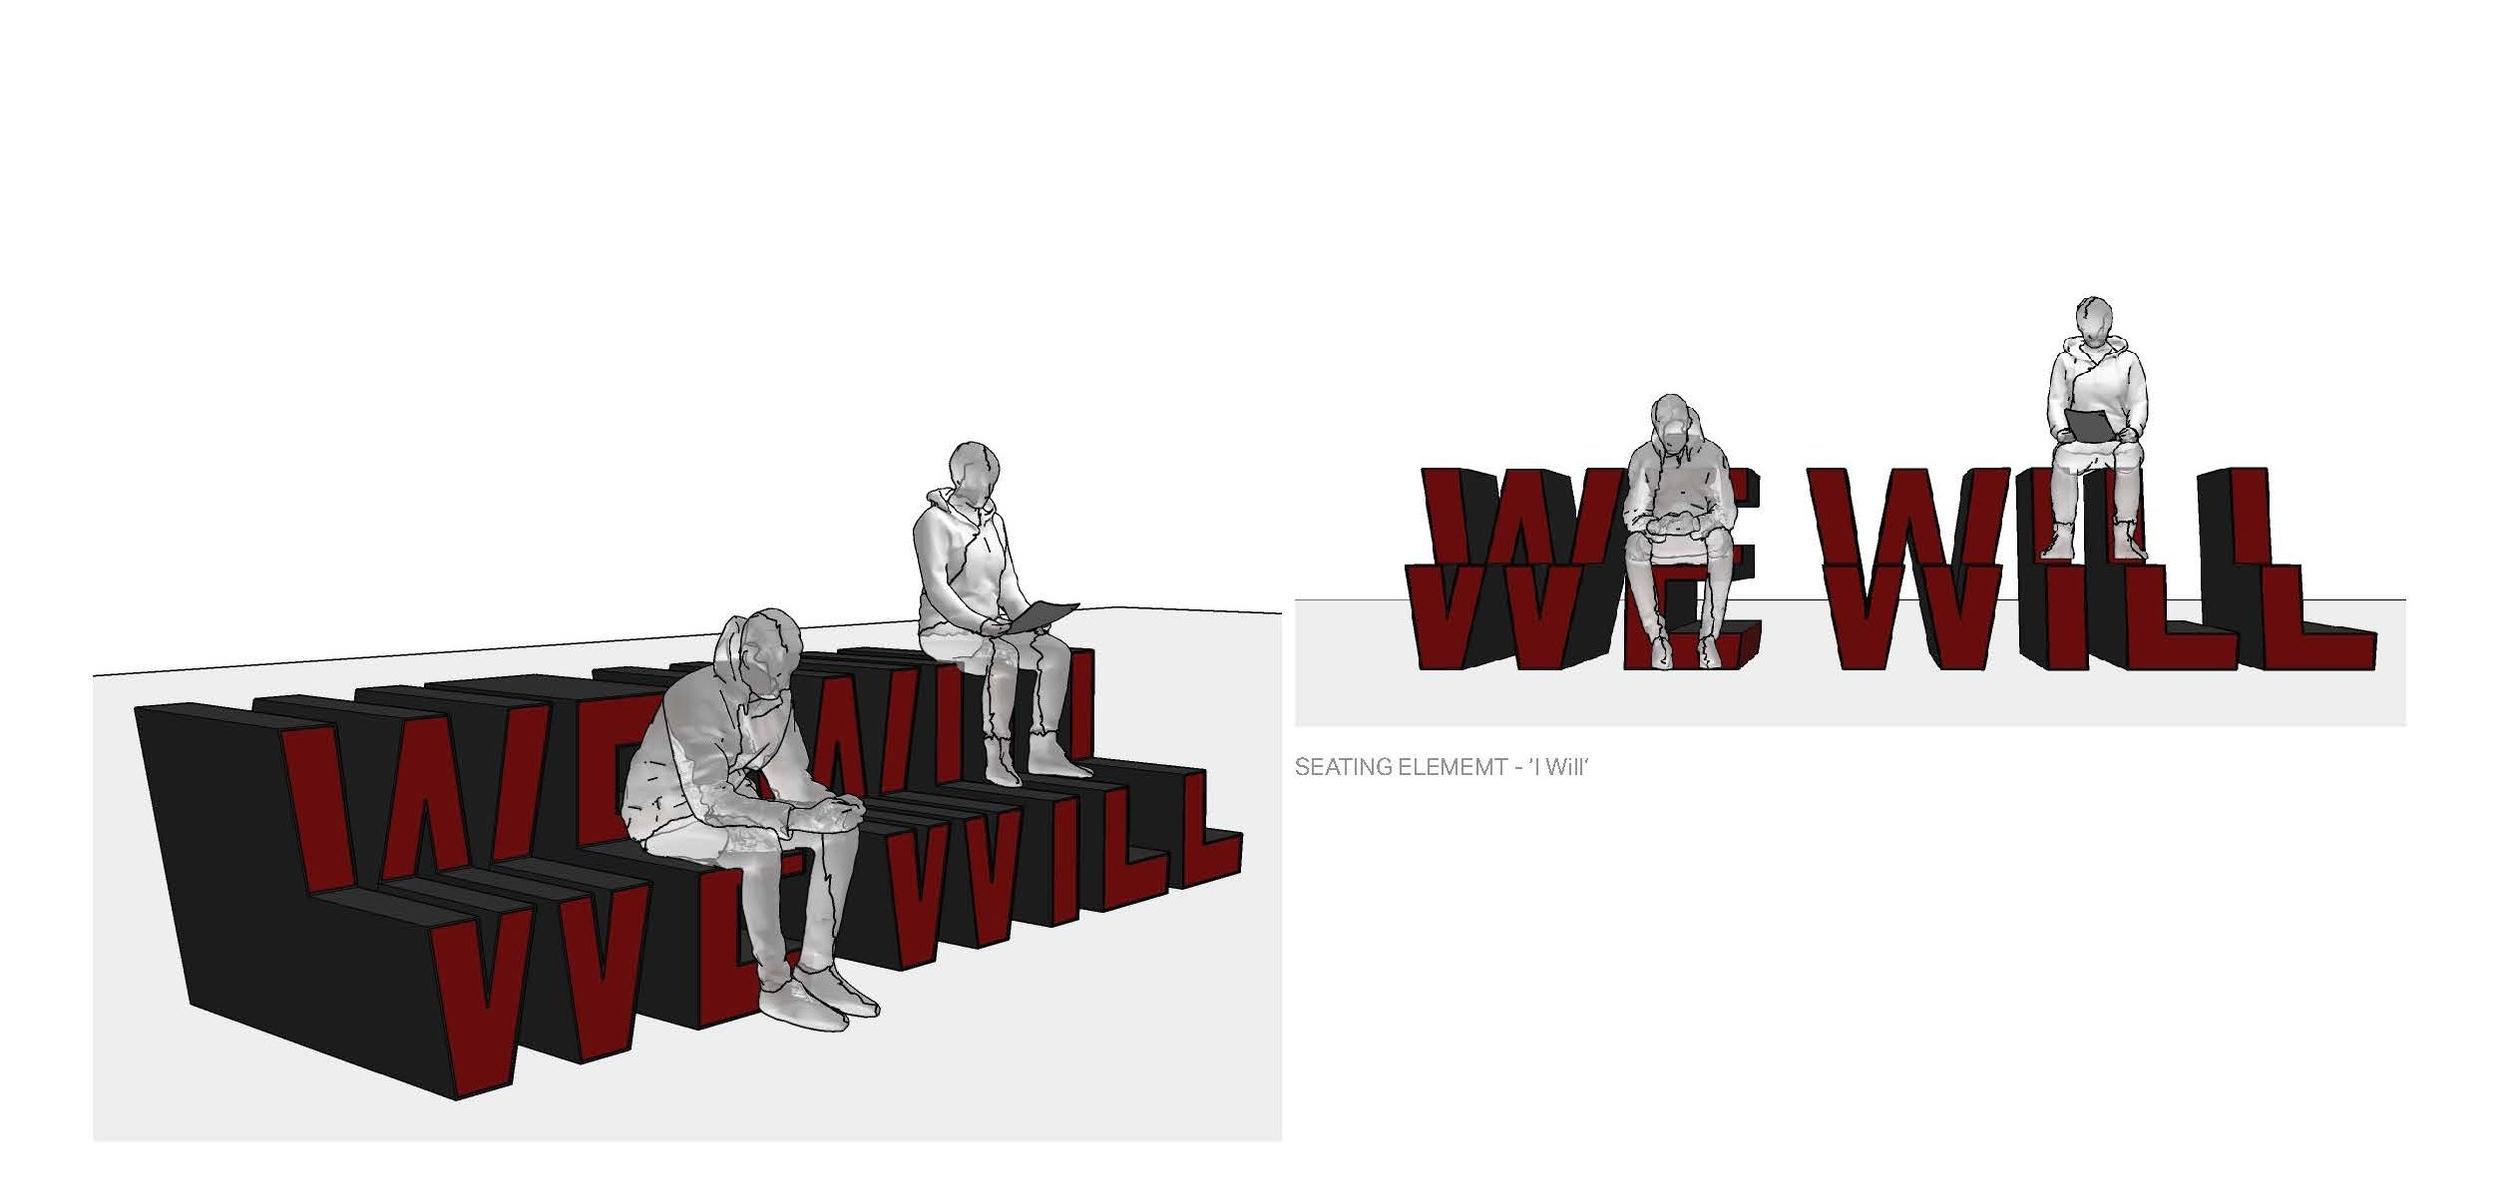 UA_BH_SKorea_OutdoorBranding_CO_Presentation_180404_Page_14.jpg